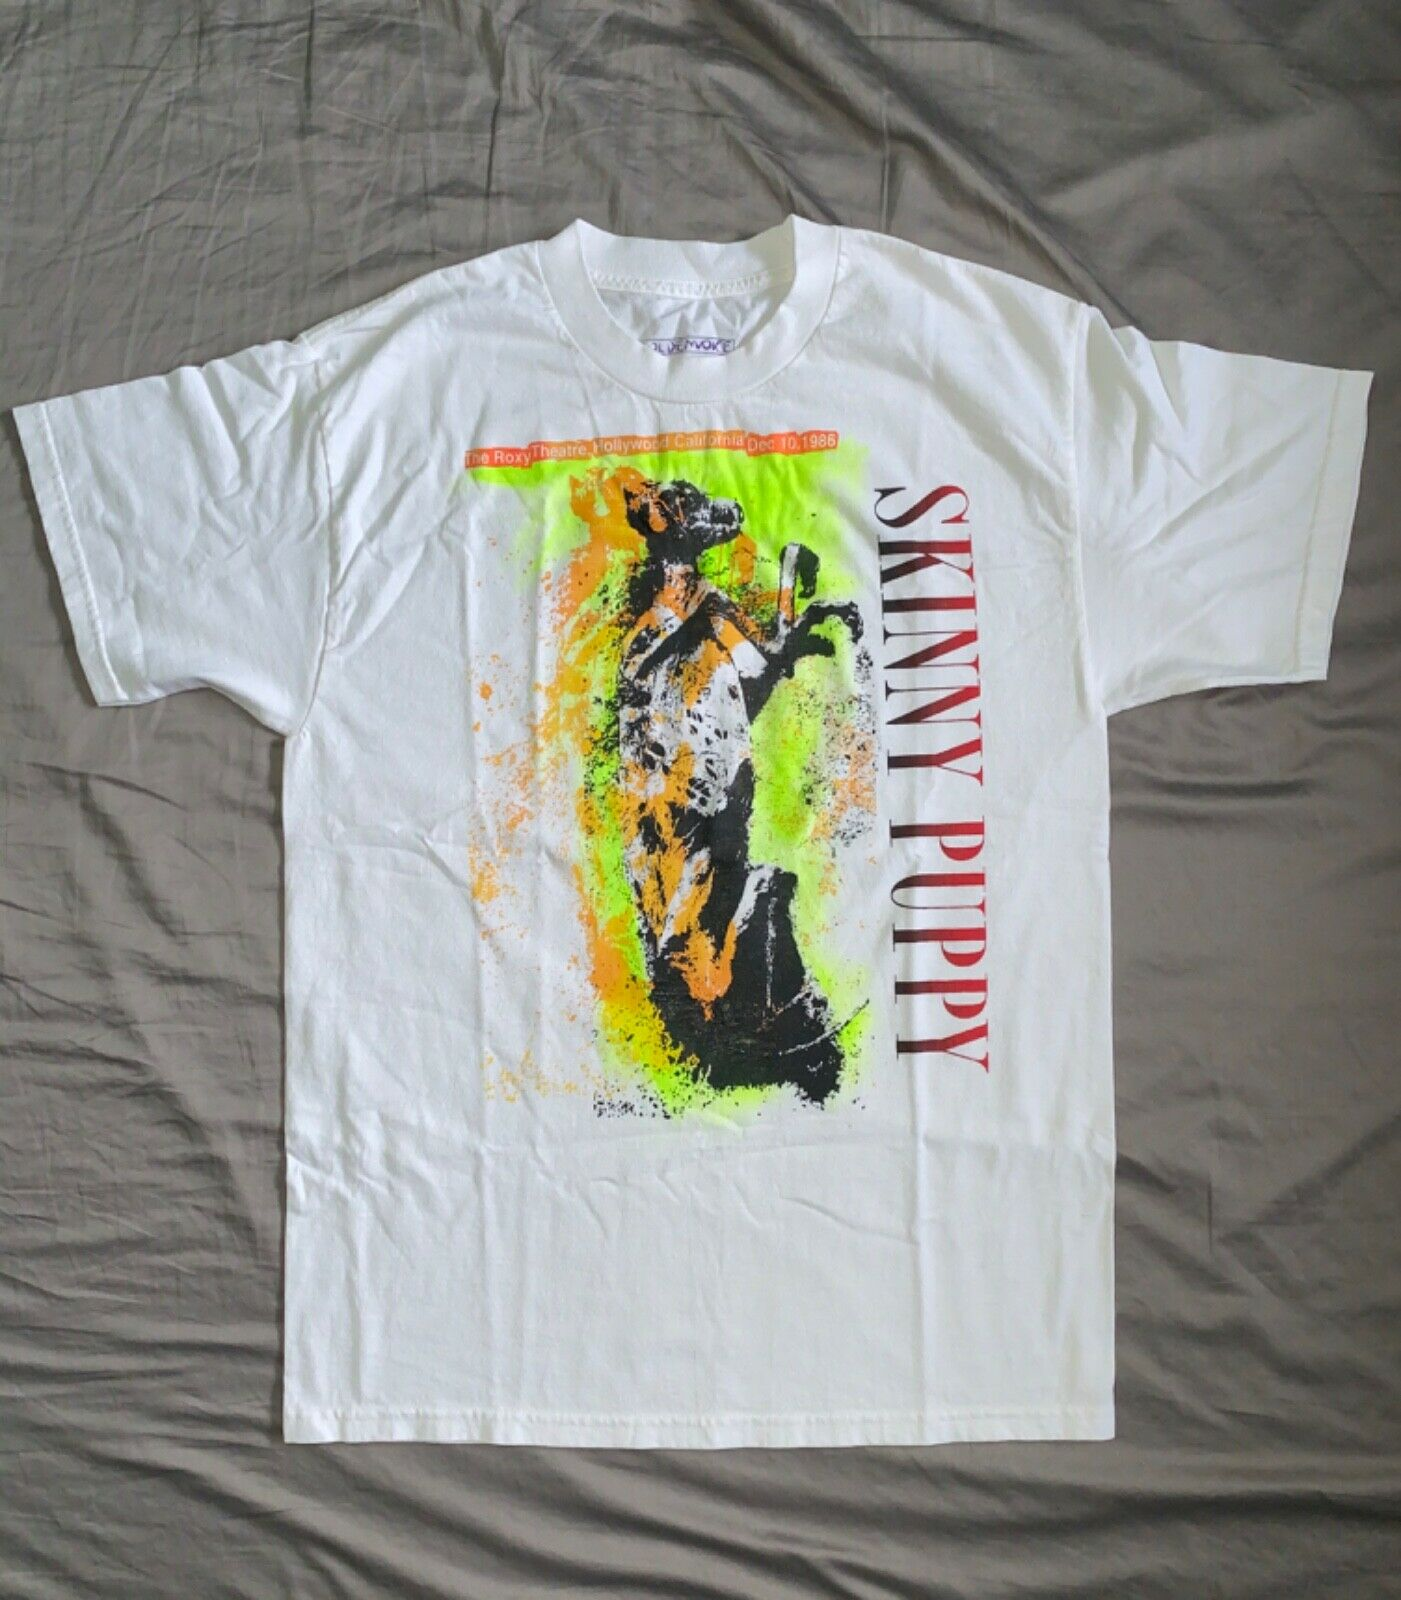 Vintage Skinny Puppy Crew Concert T Shirt Tour Nos Kmfdm Ministry Pigface Tshirt